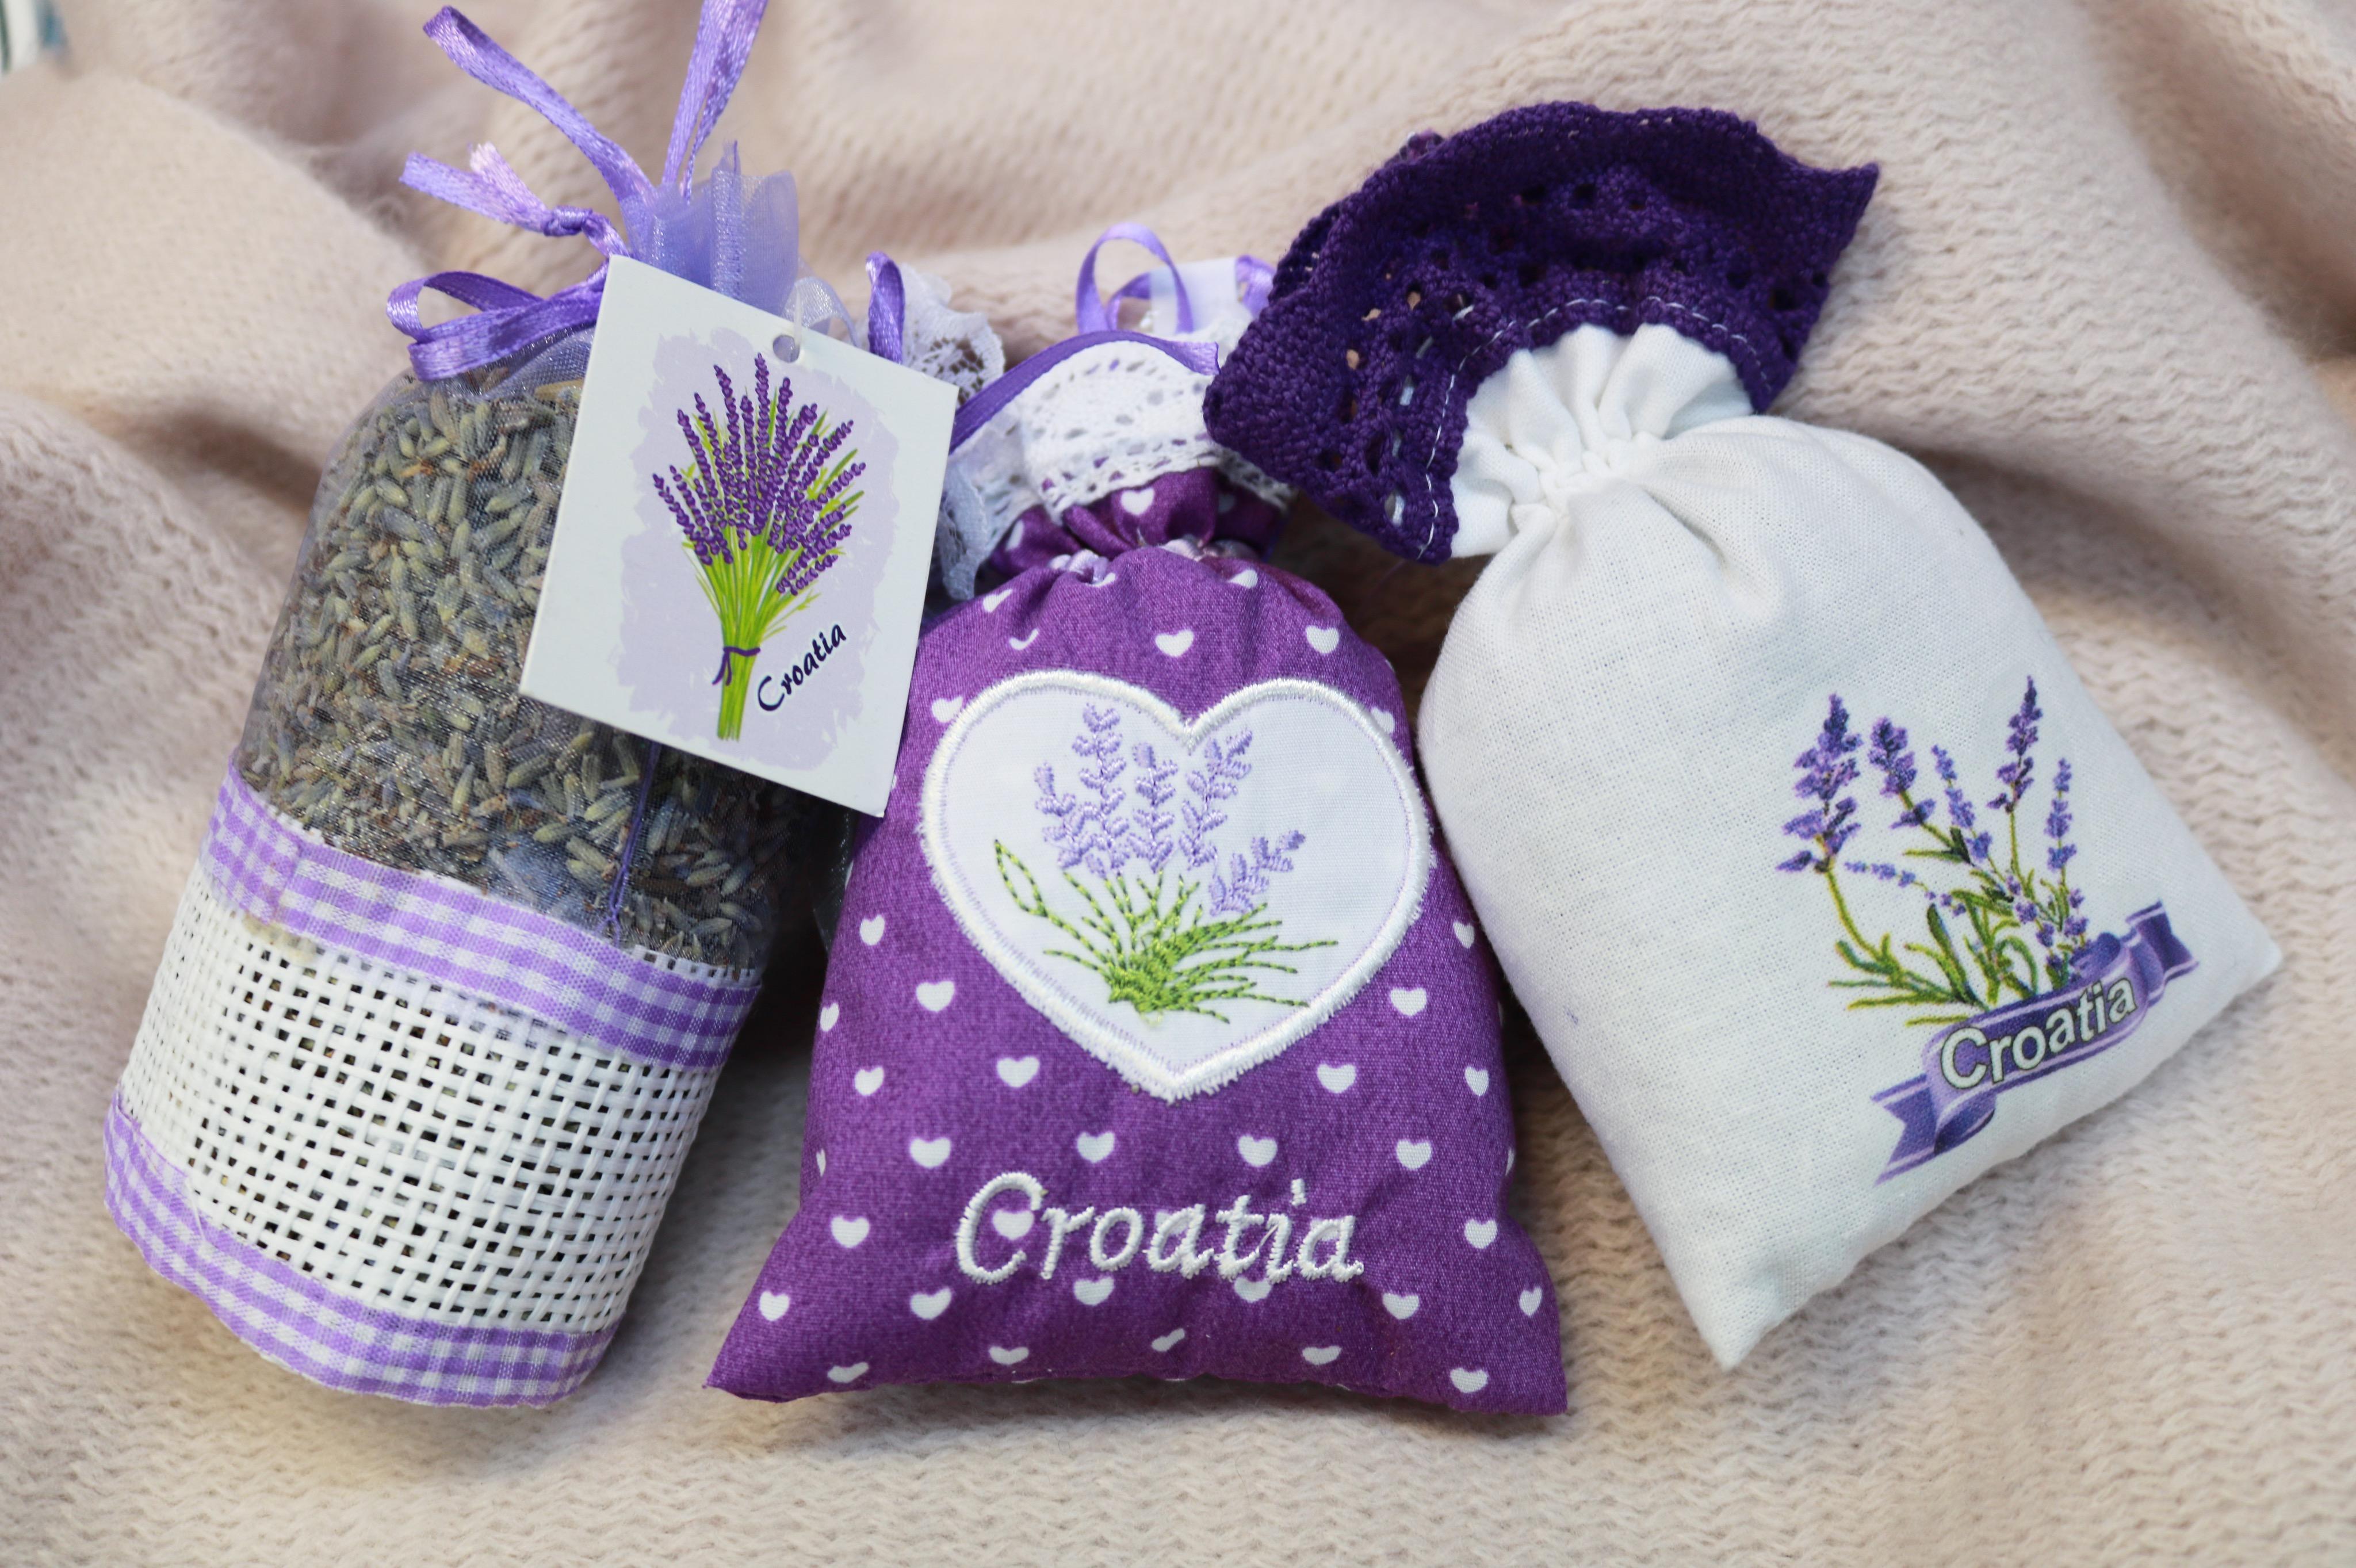 Lavender souvenir Croatia